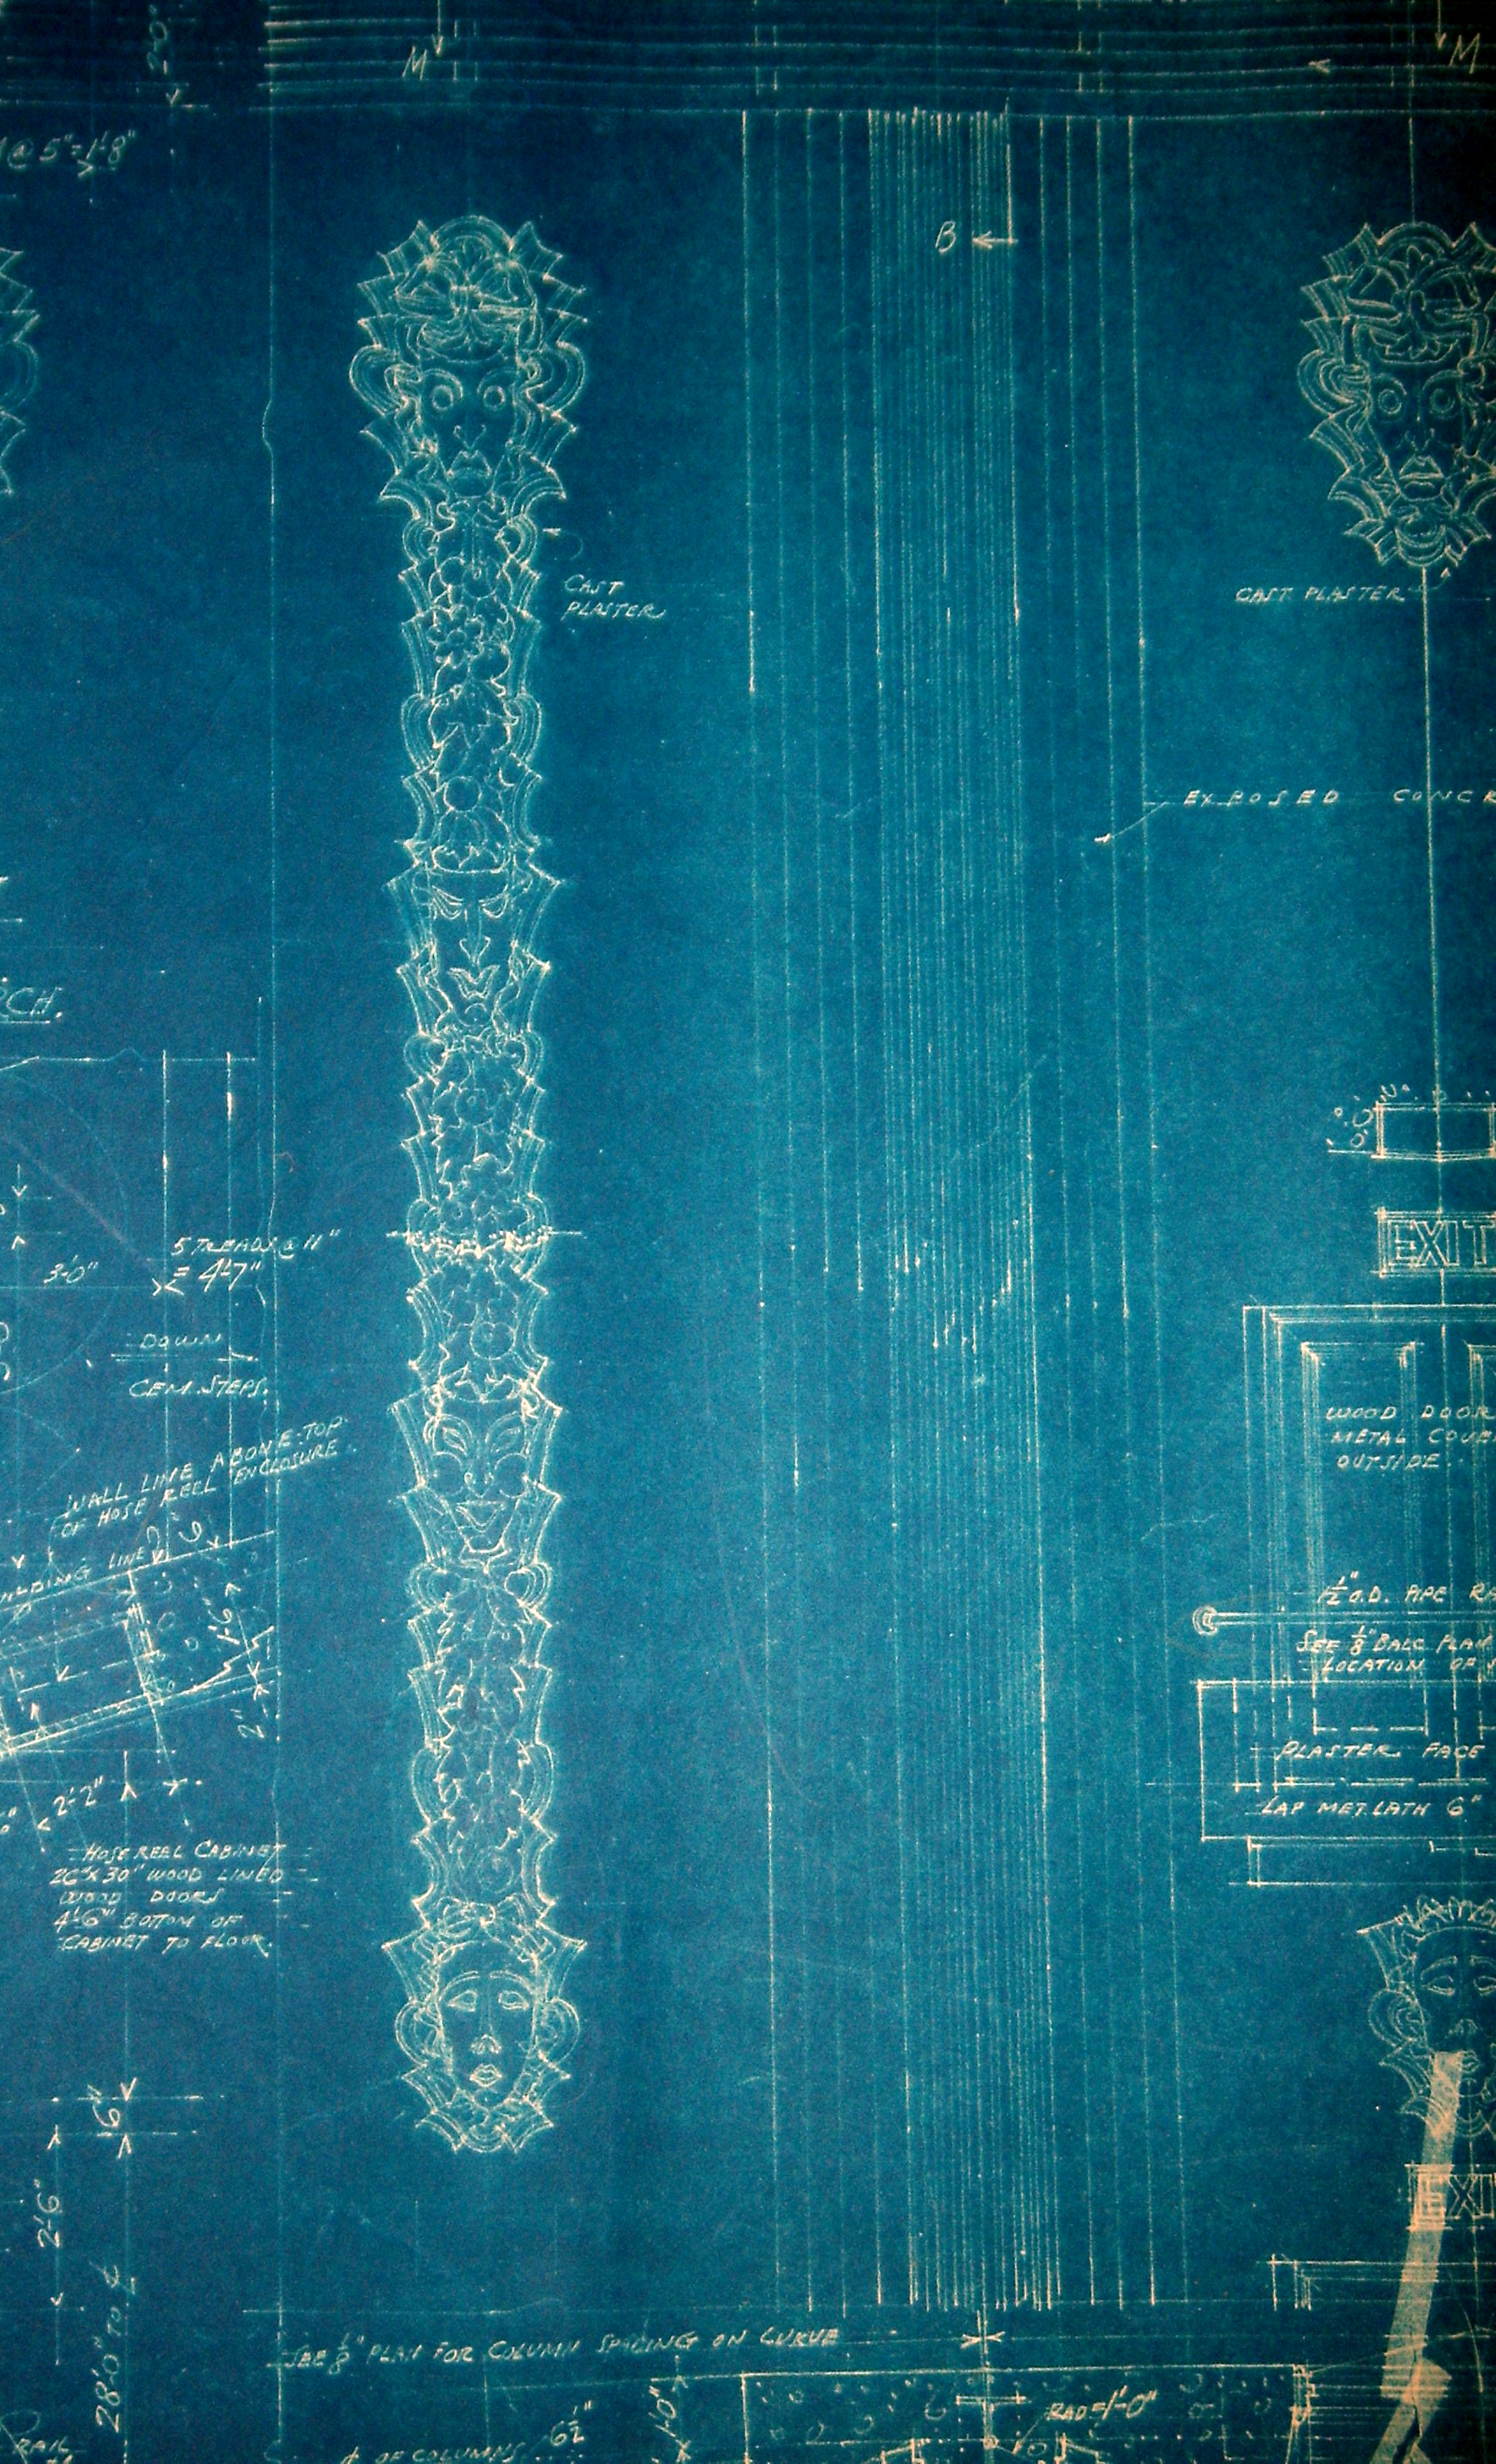 El rey theatre blueprints show whats missing timothy pflueger blog el rey blueprints malvernweather Choice Image